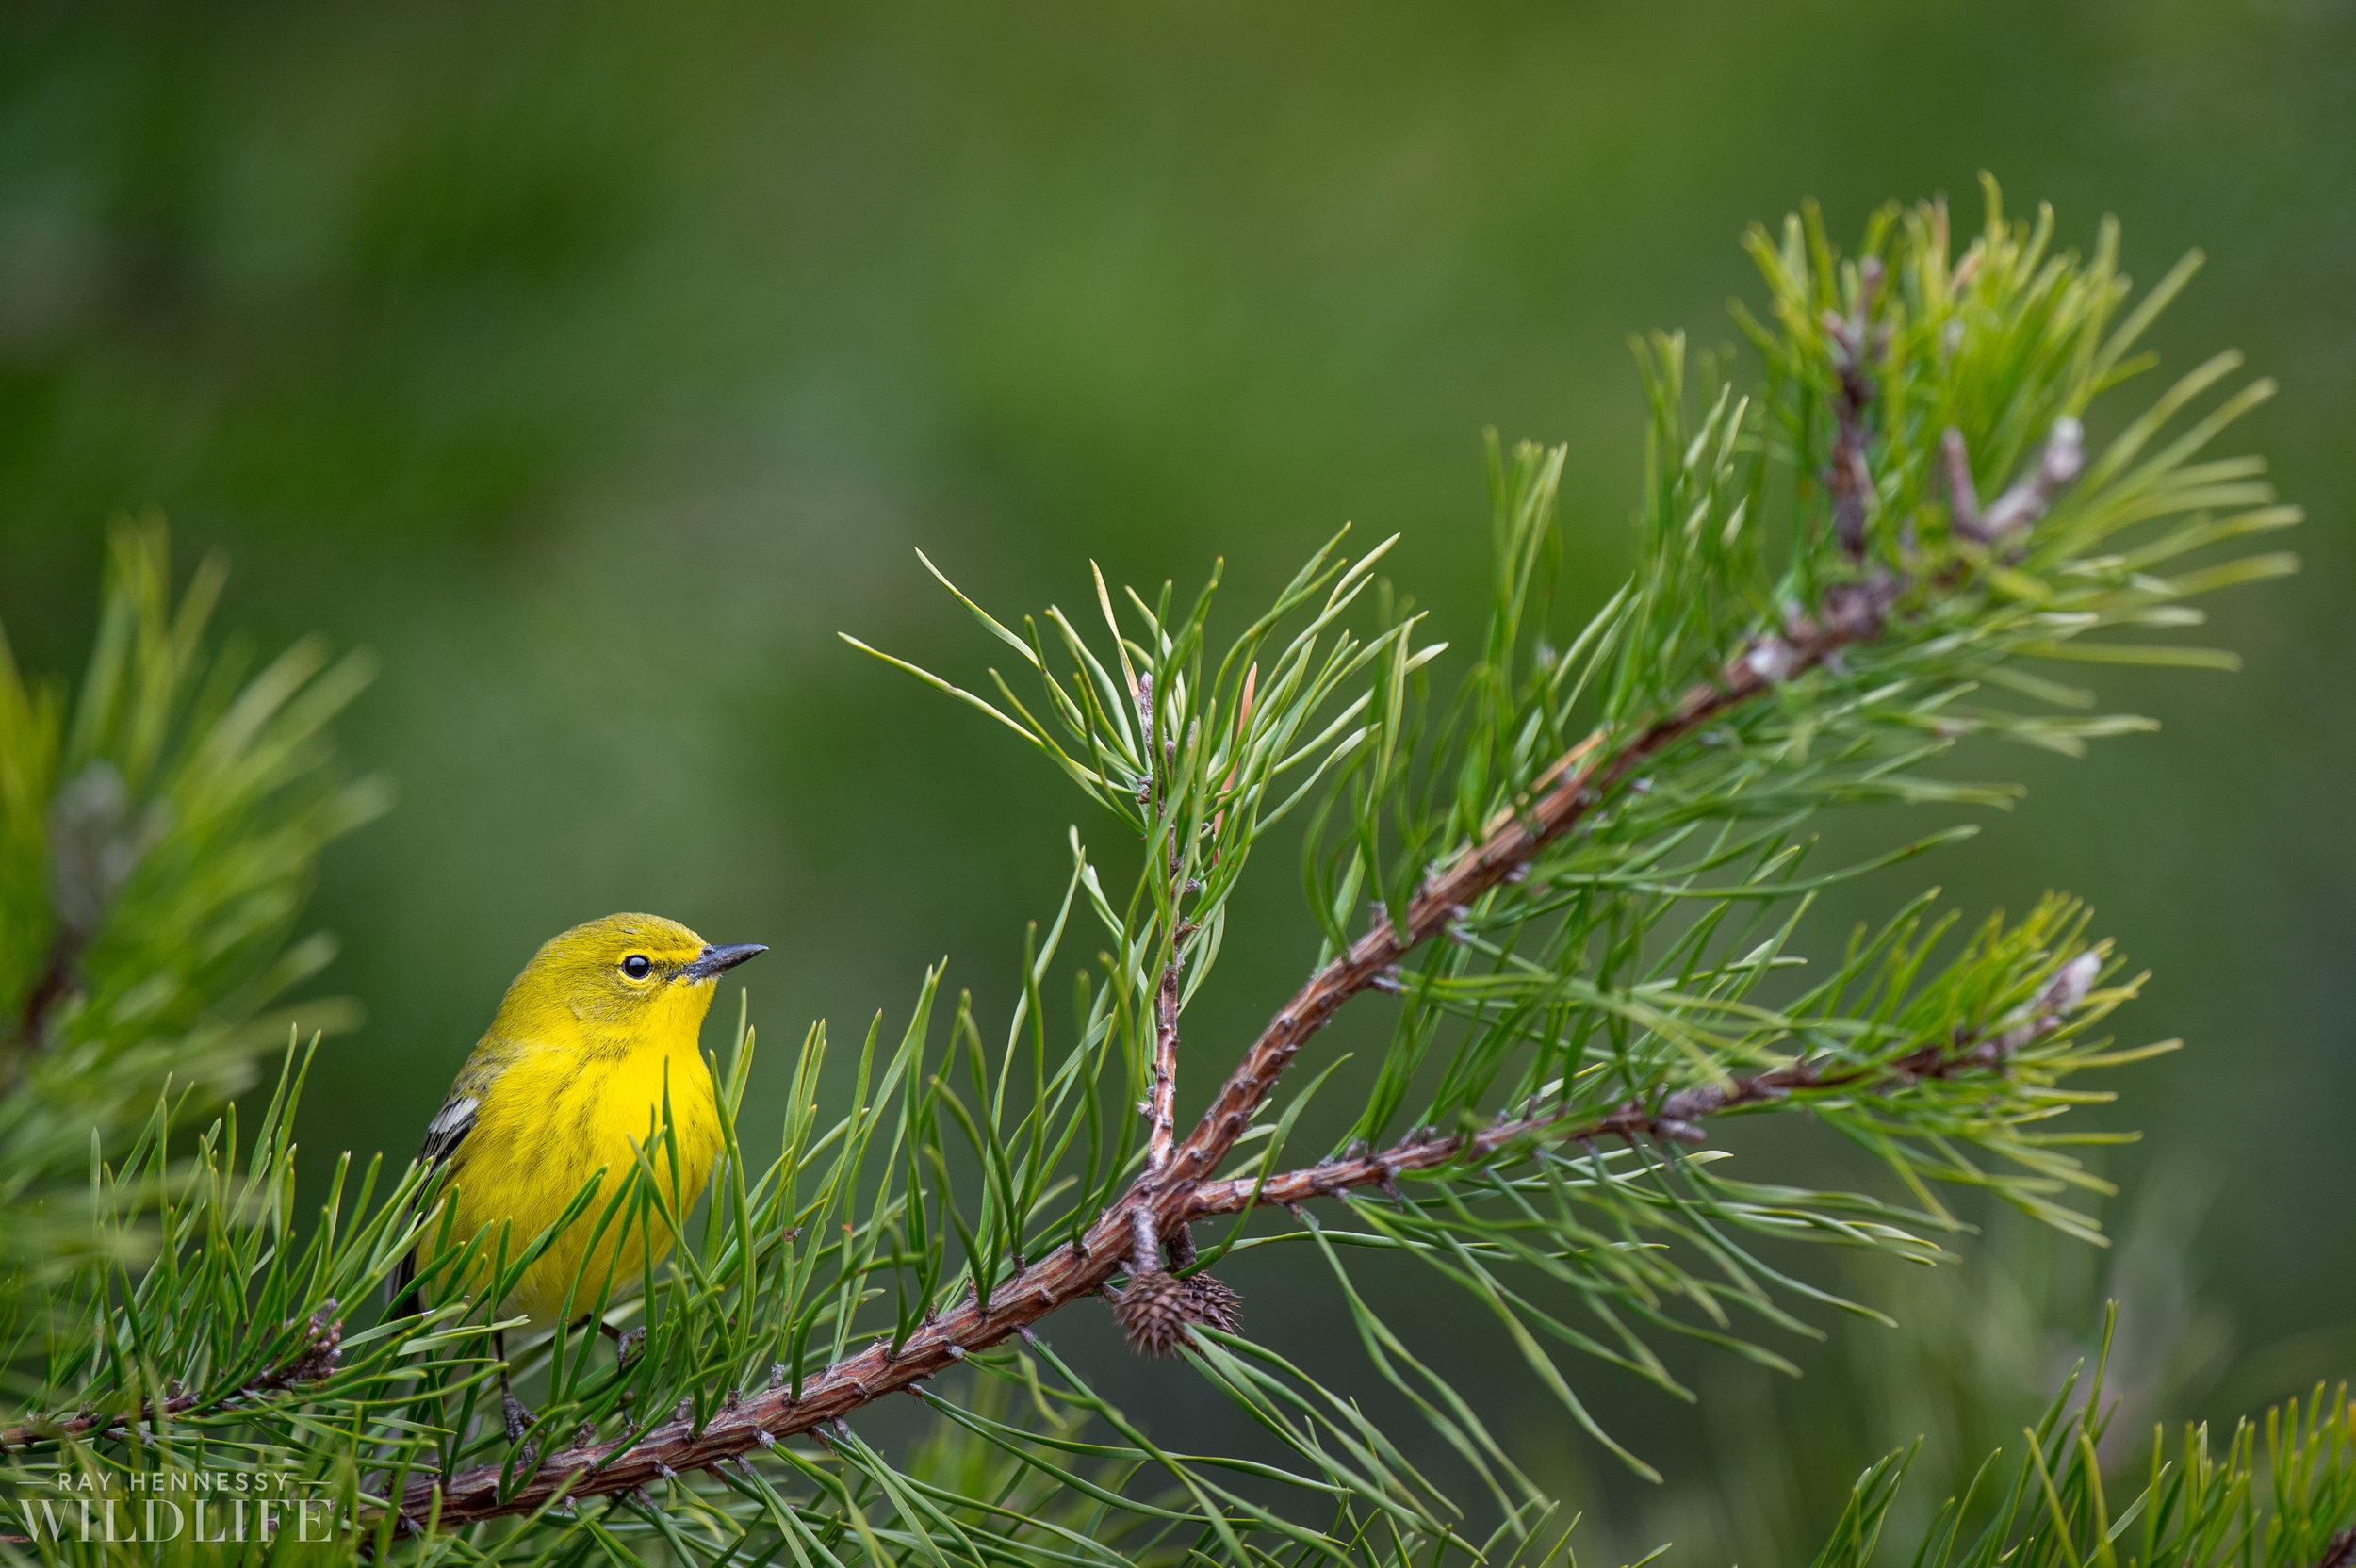 006_pine-warbler.jpg